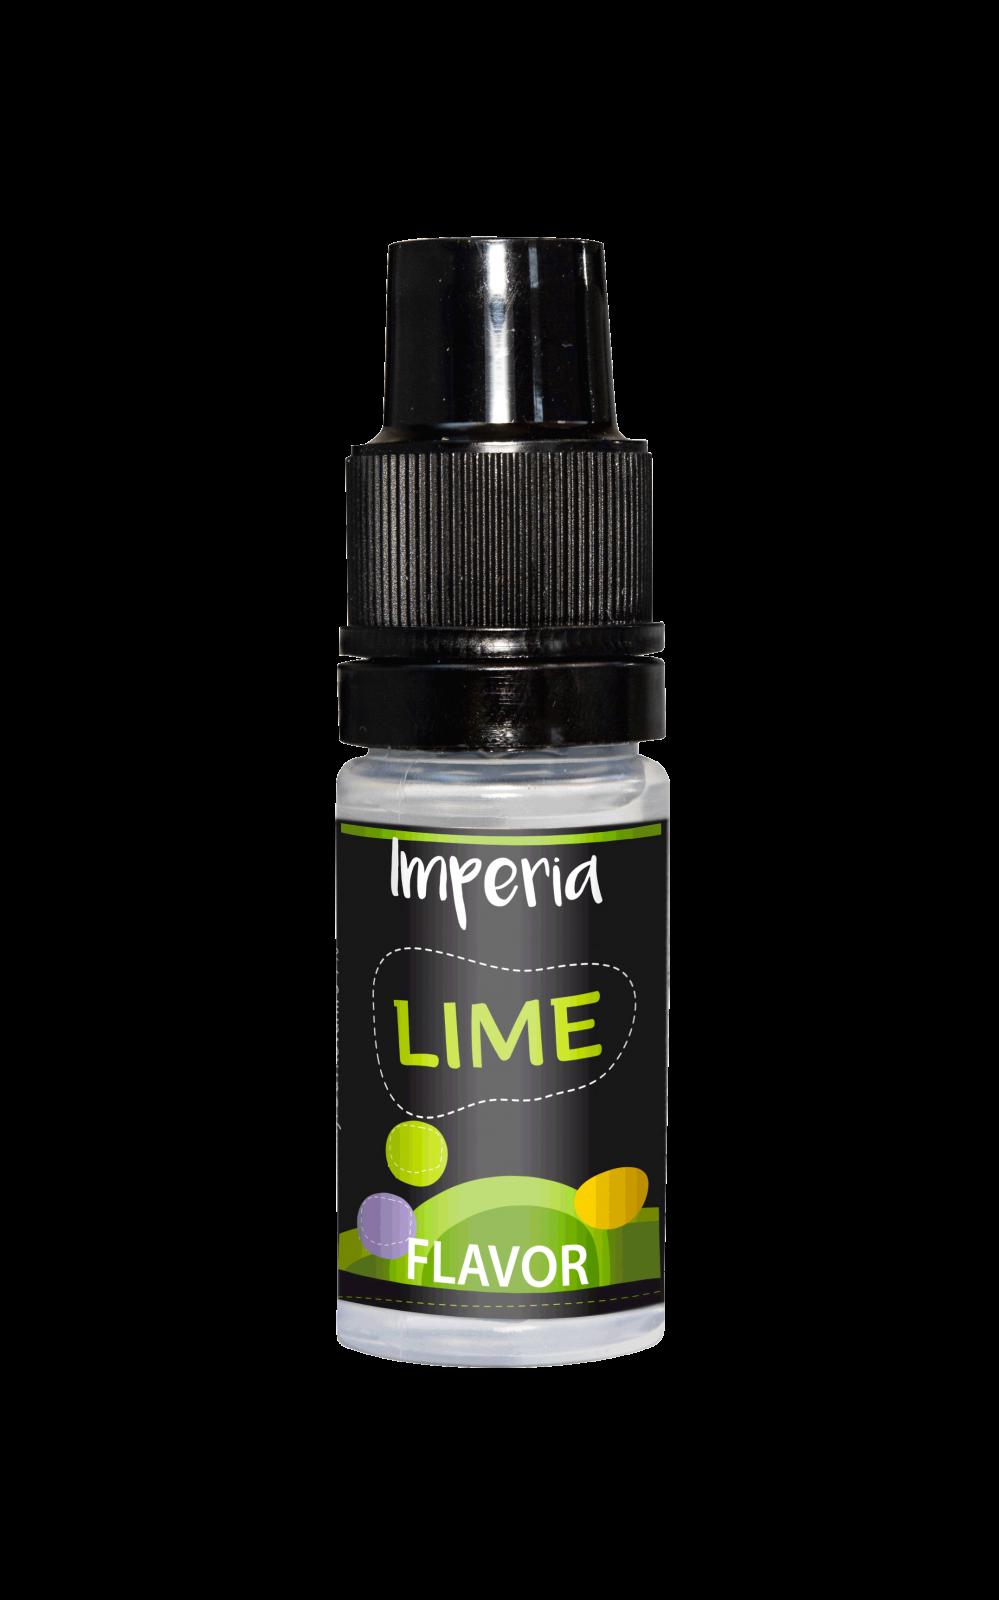 LIME / Limetka - Aróma Imperia Black Label Boudoir Samadhi s.r.o.